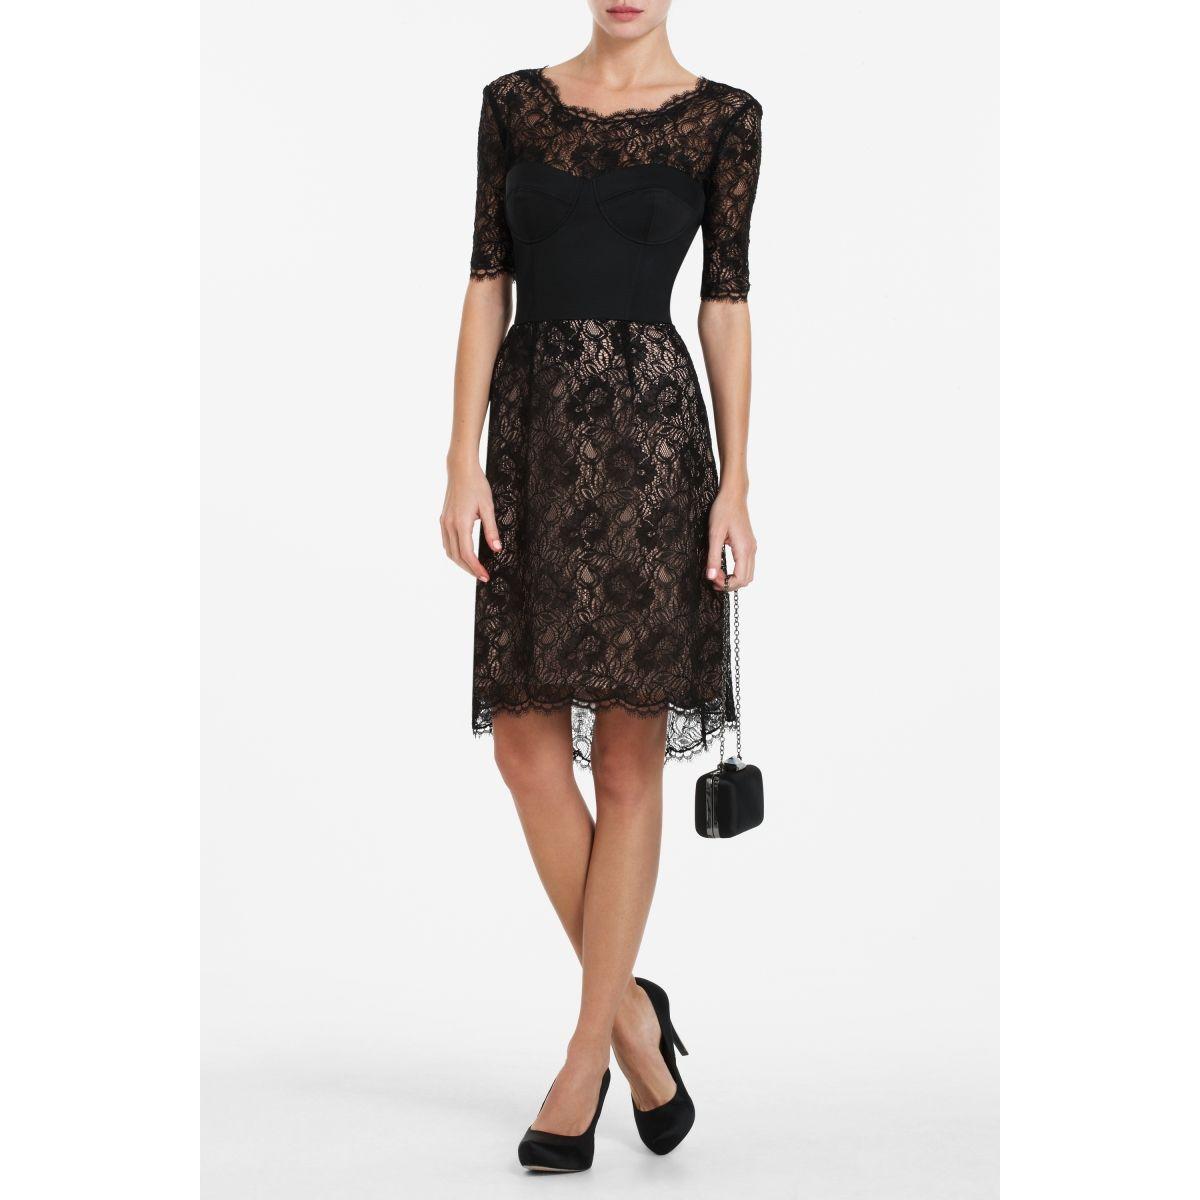 78 Best images about Dresses on Pinterest - Half sleeve dresses ...